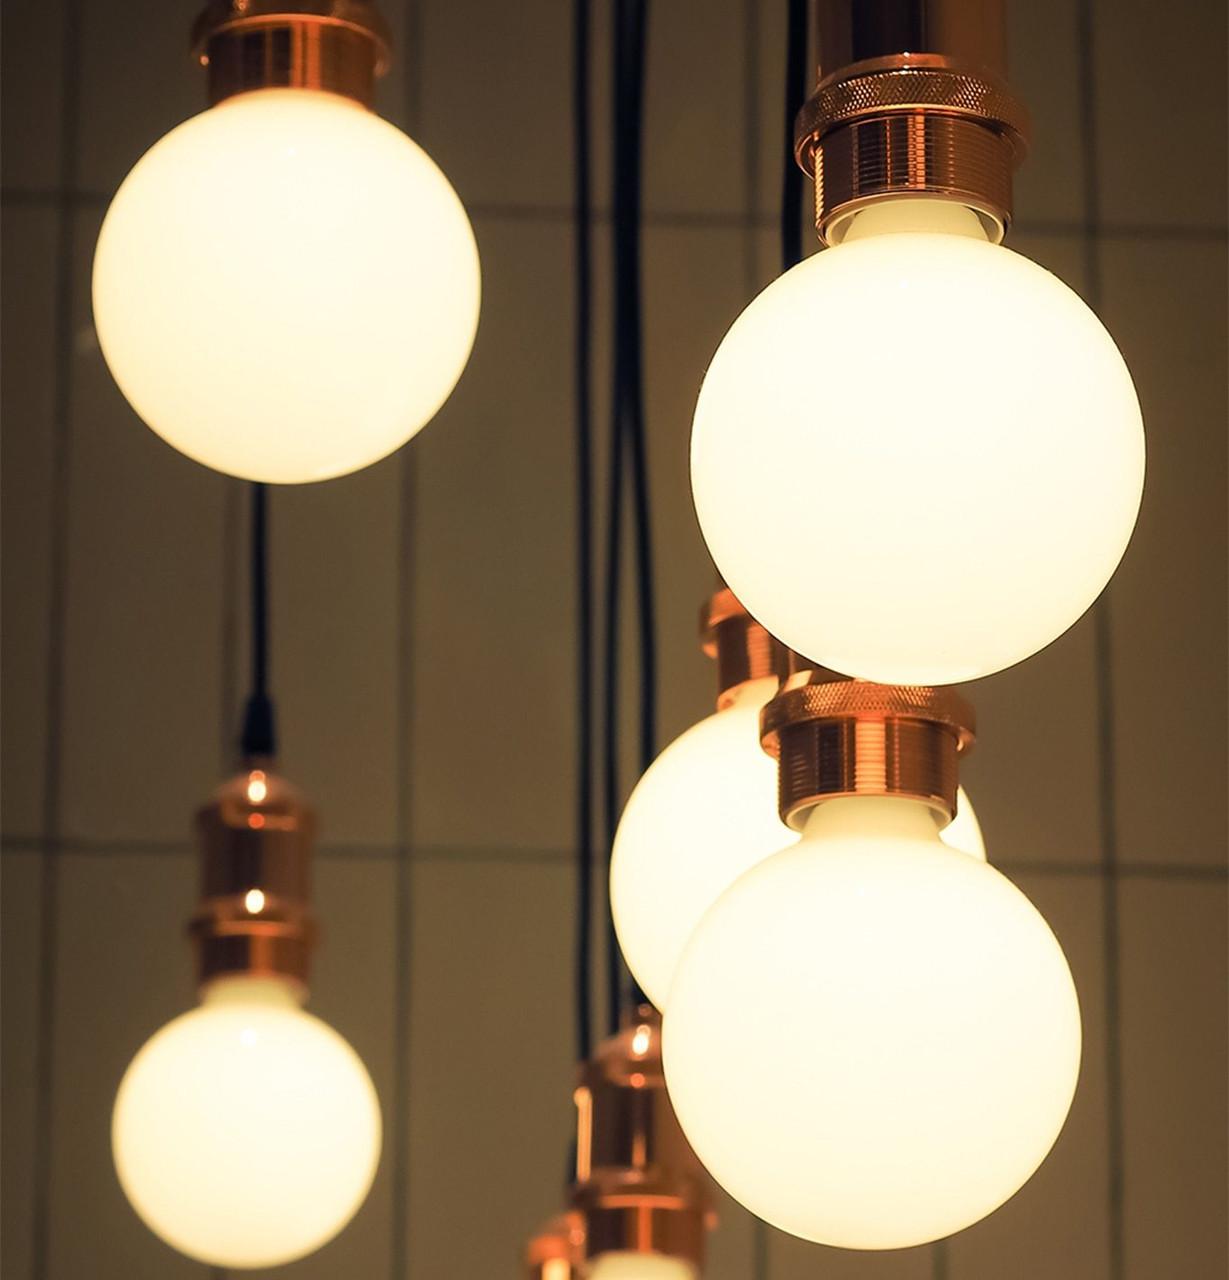 LED G80 Extra Warm White Light Bulbs